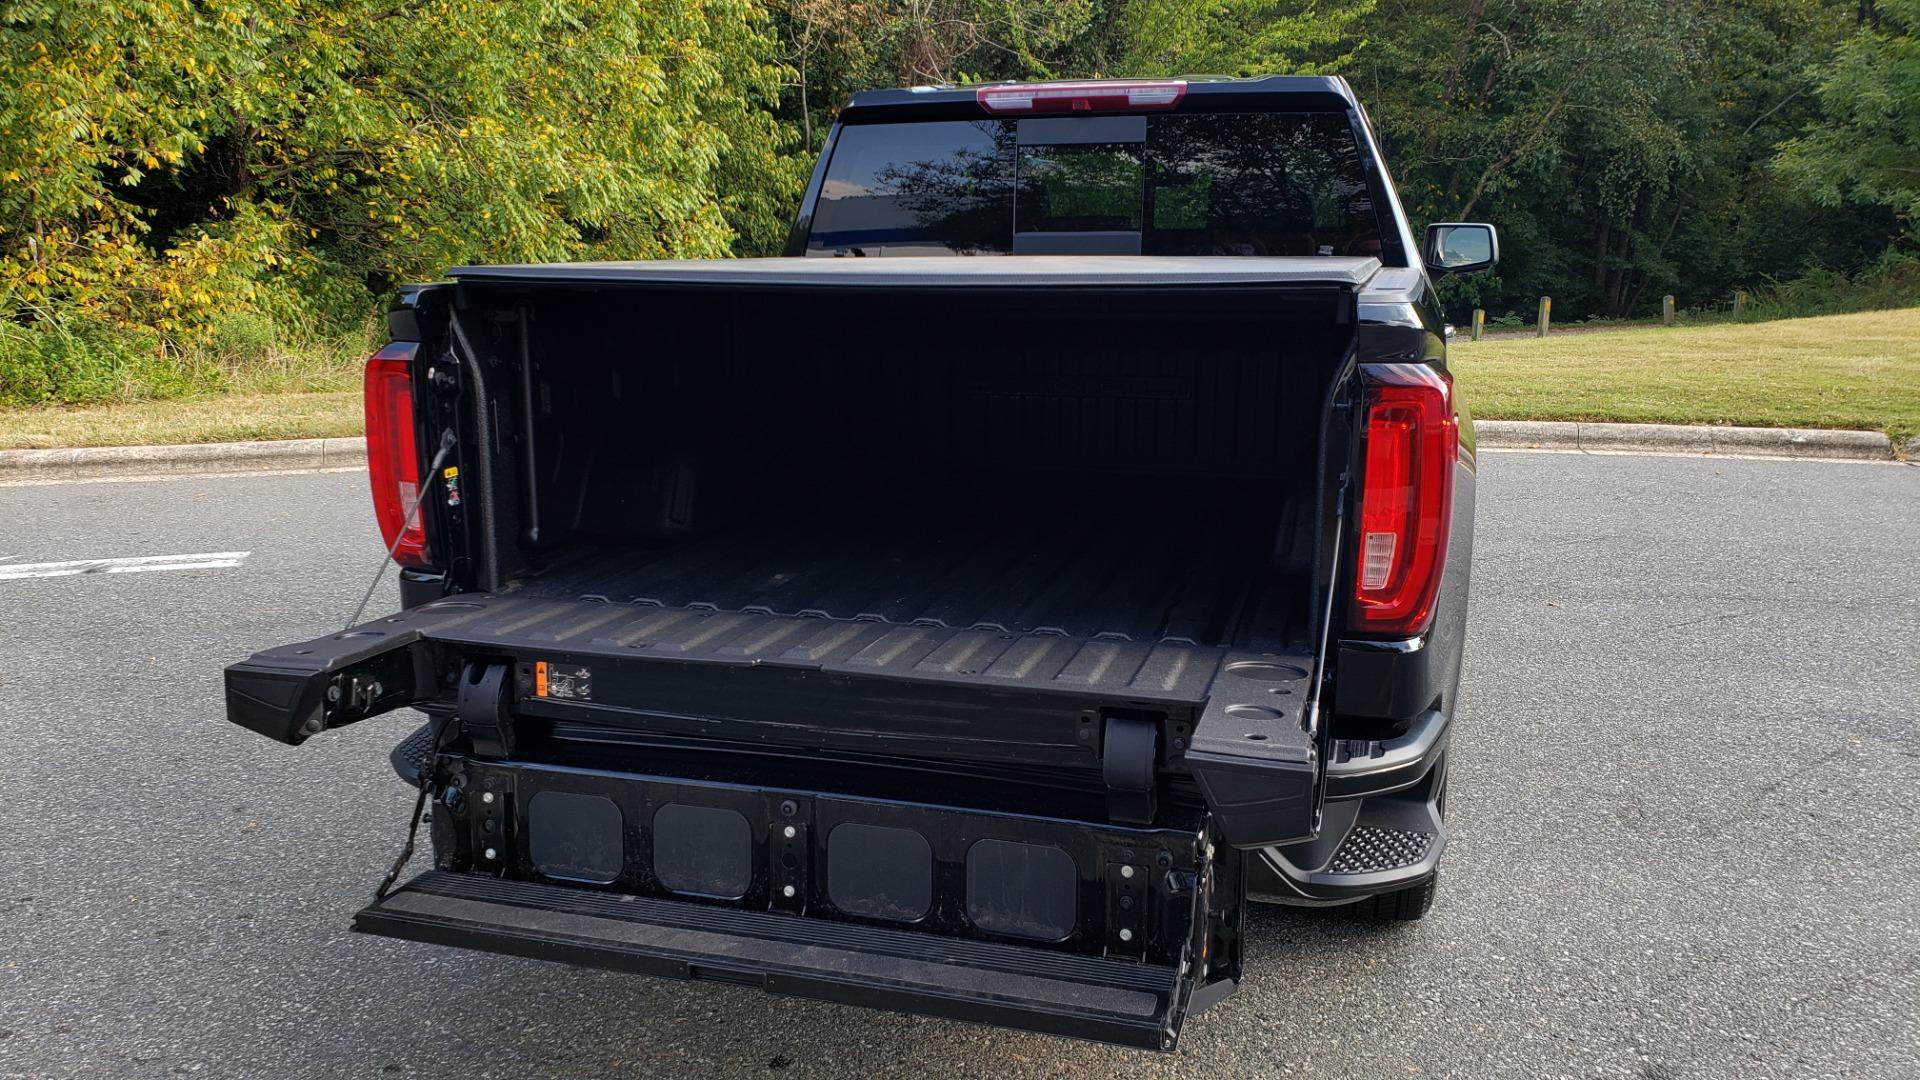 Used 2019 GMC SIERRA 1500 DENALI ULTIMATE 4WD / NAV / TECH PKG / DRVR ALRT for sale Sold at Formula Imports in Charlotte NC 28227 24